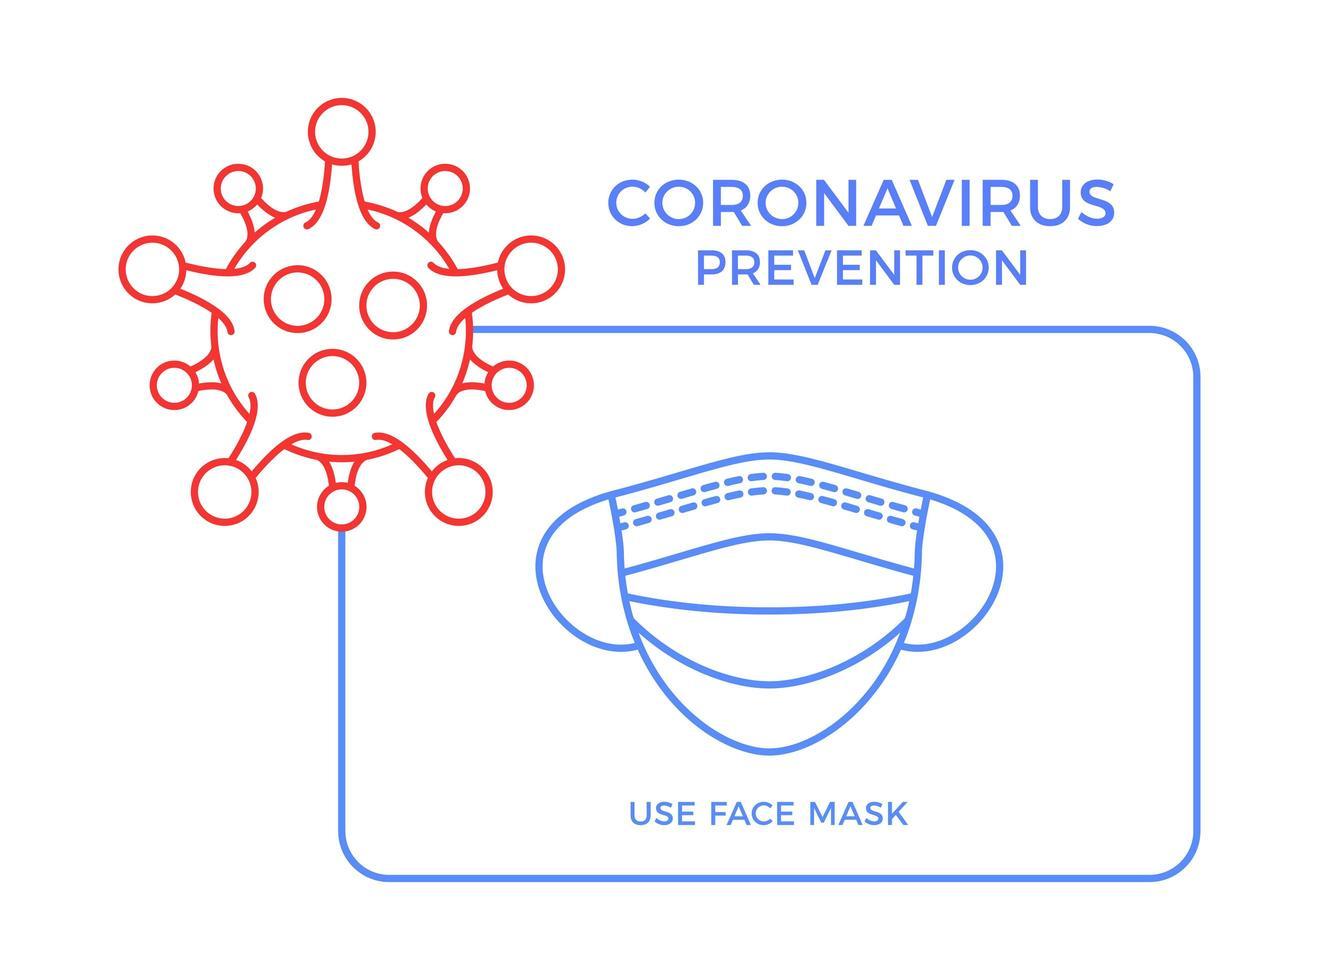 banner mascarilla icono prevención coronavirus. concepto de protección covid-19 signo ilustración vectorial. Fondo de diseño de prevención de covid-19. vector